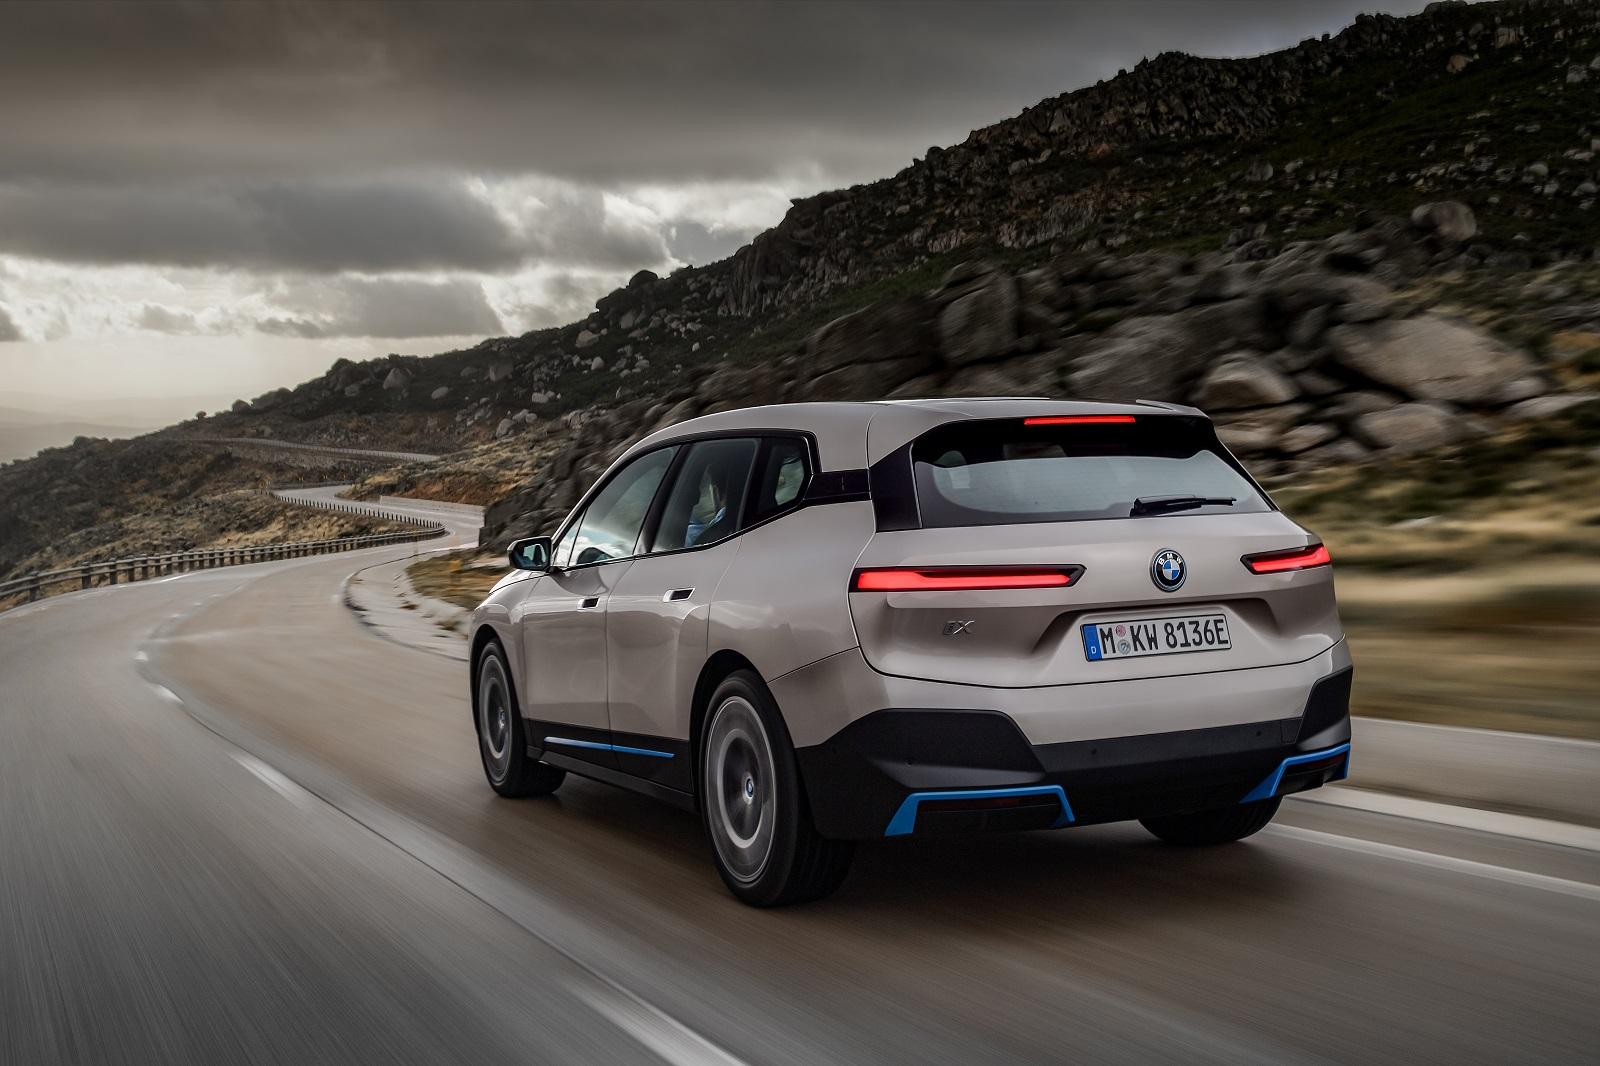 BMW iX concept